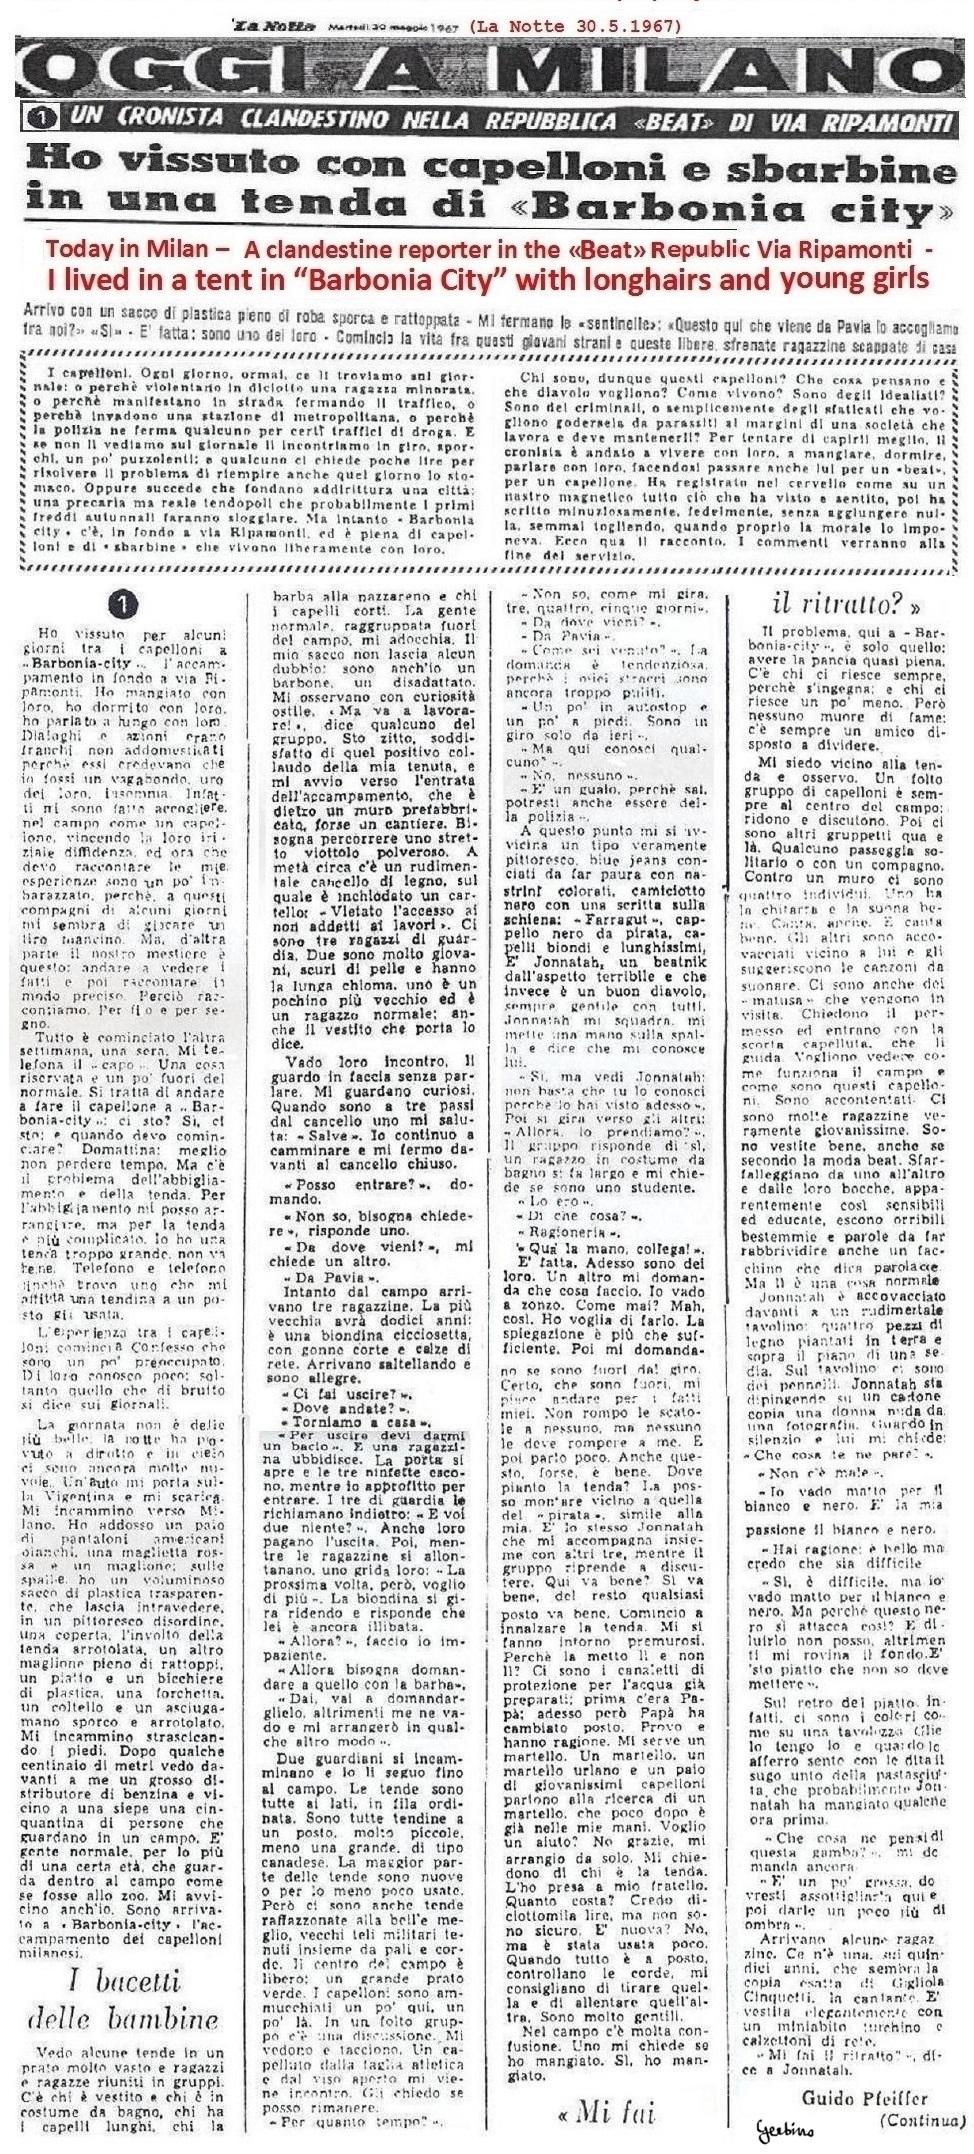 La Notte May 30,1967